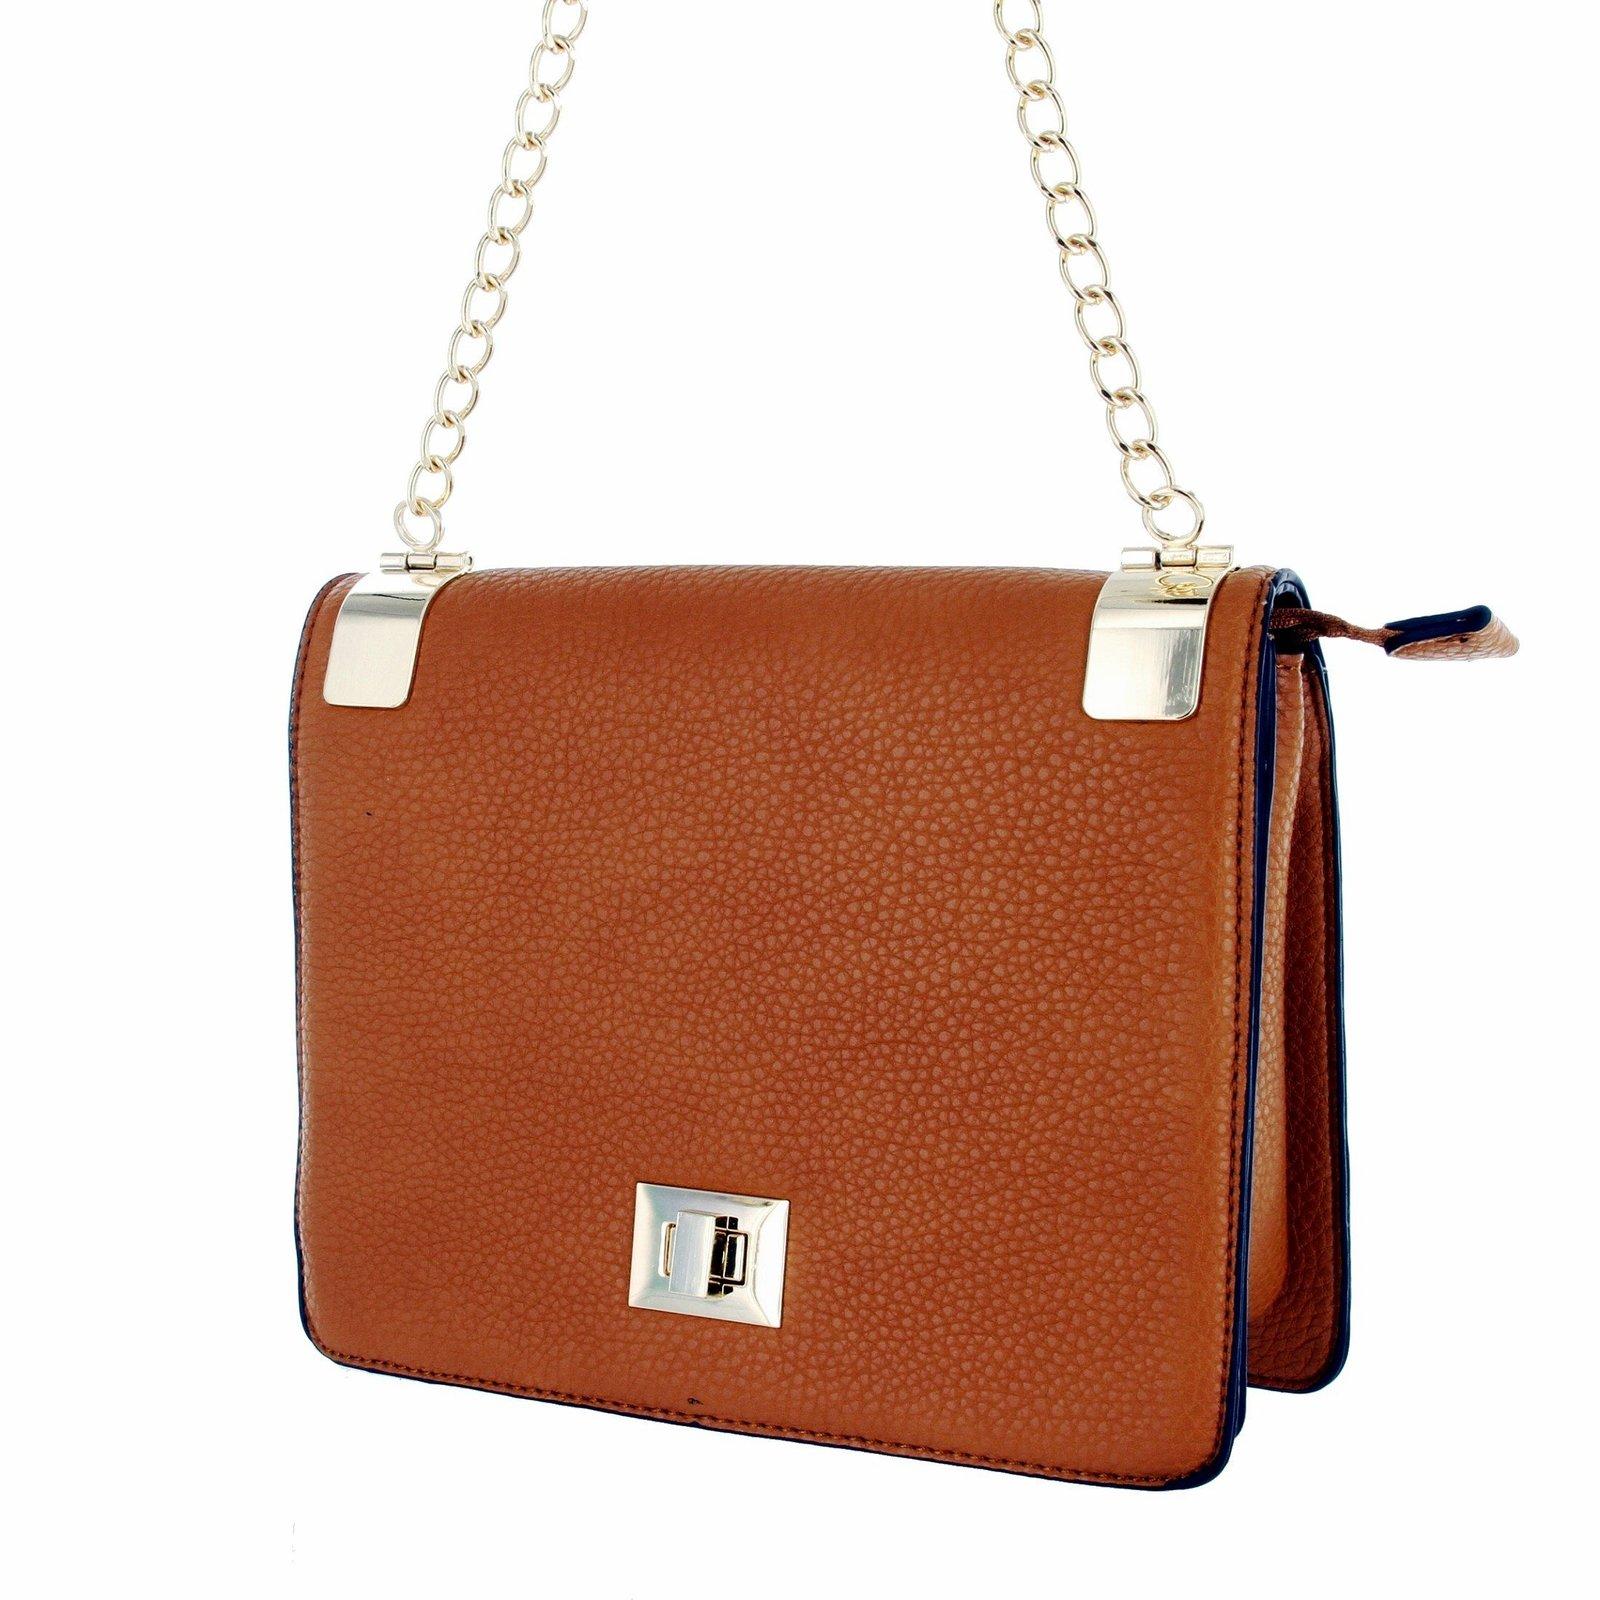 e7fa2cbe1 81qizg1chol. 81qizg1chol. Alyssa Women's Classic Faux Leather Designer  Crossbody Shoulder Bag Handbag ...